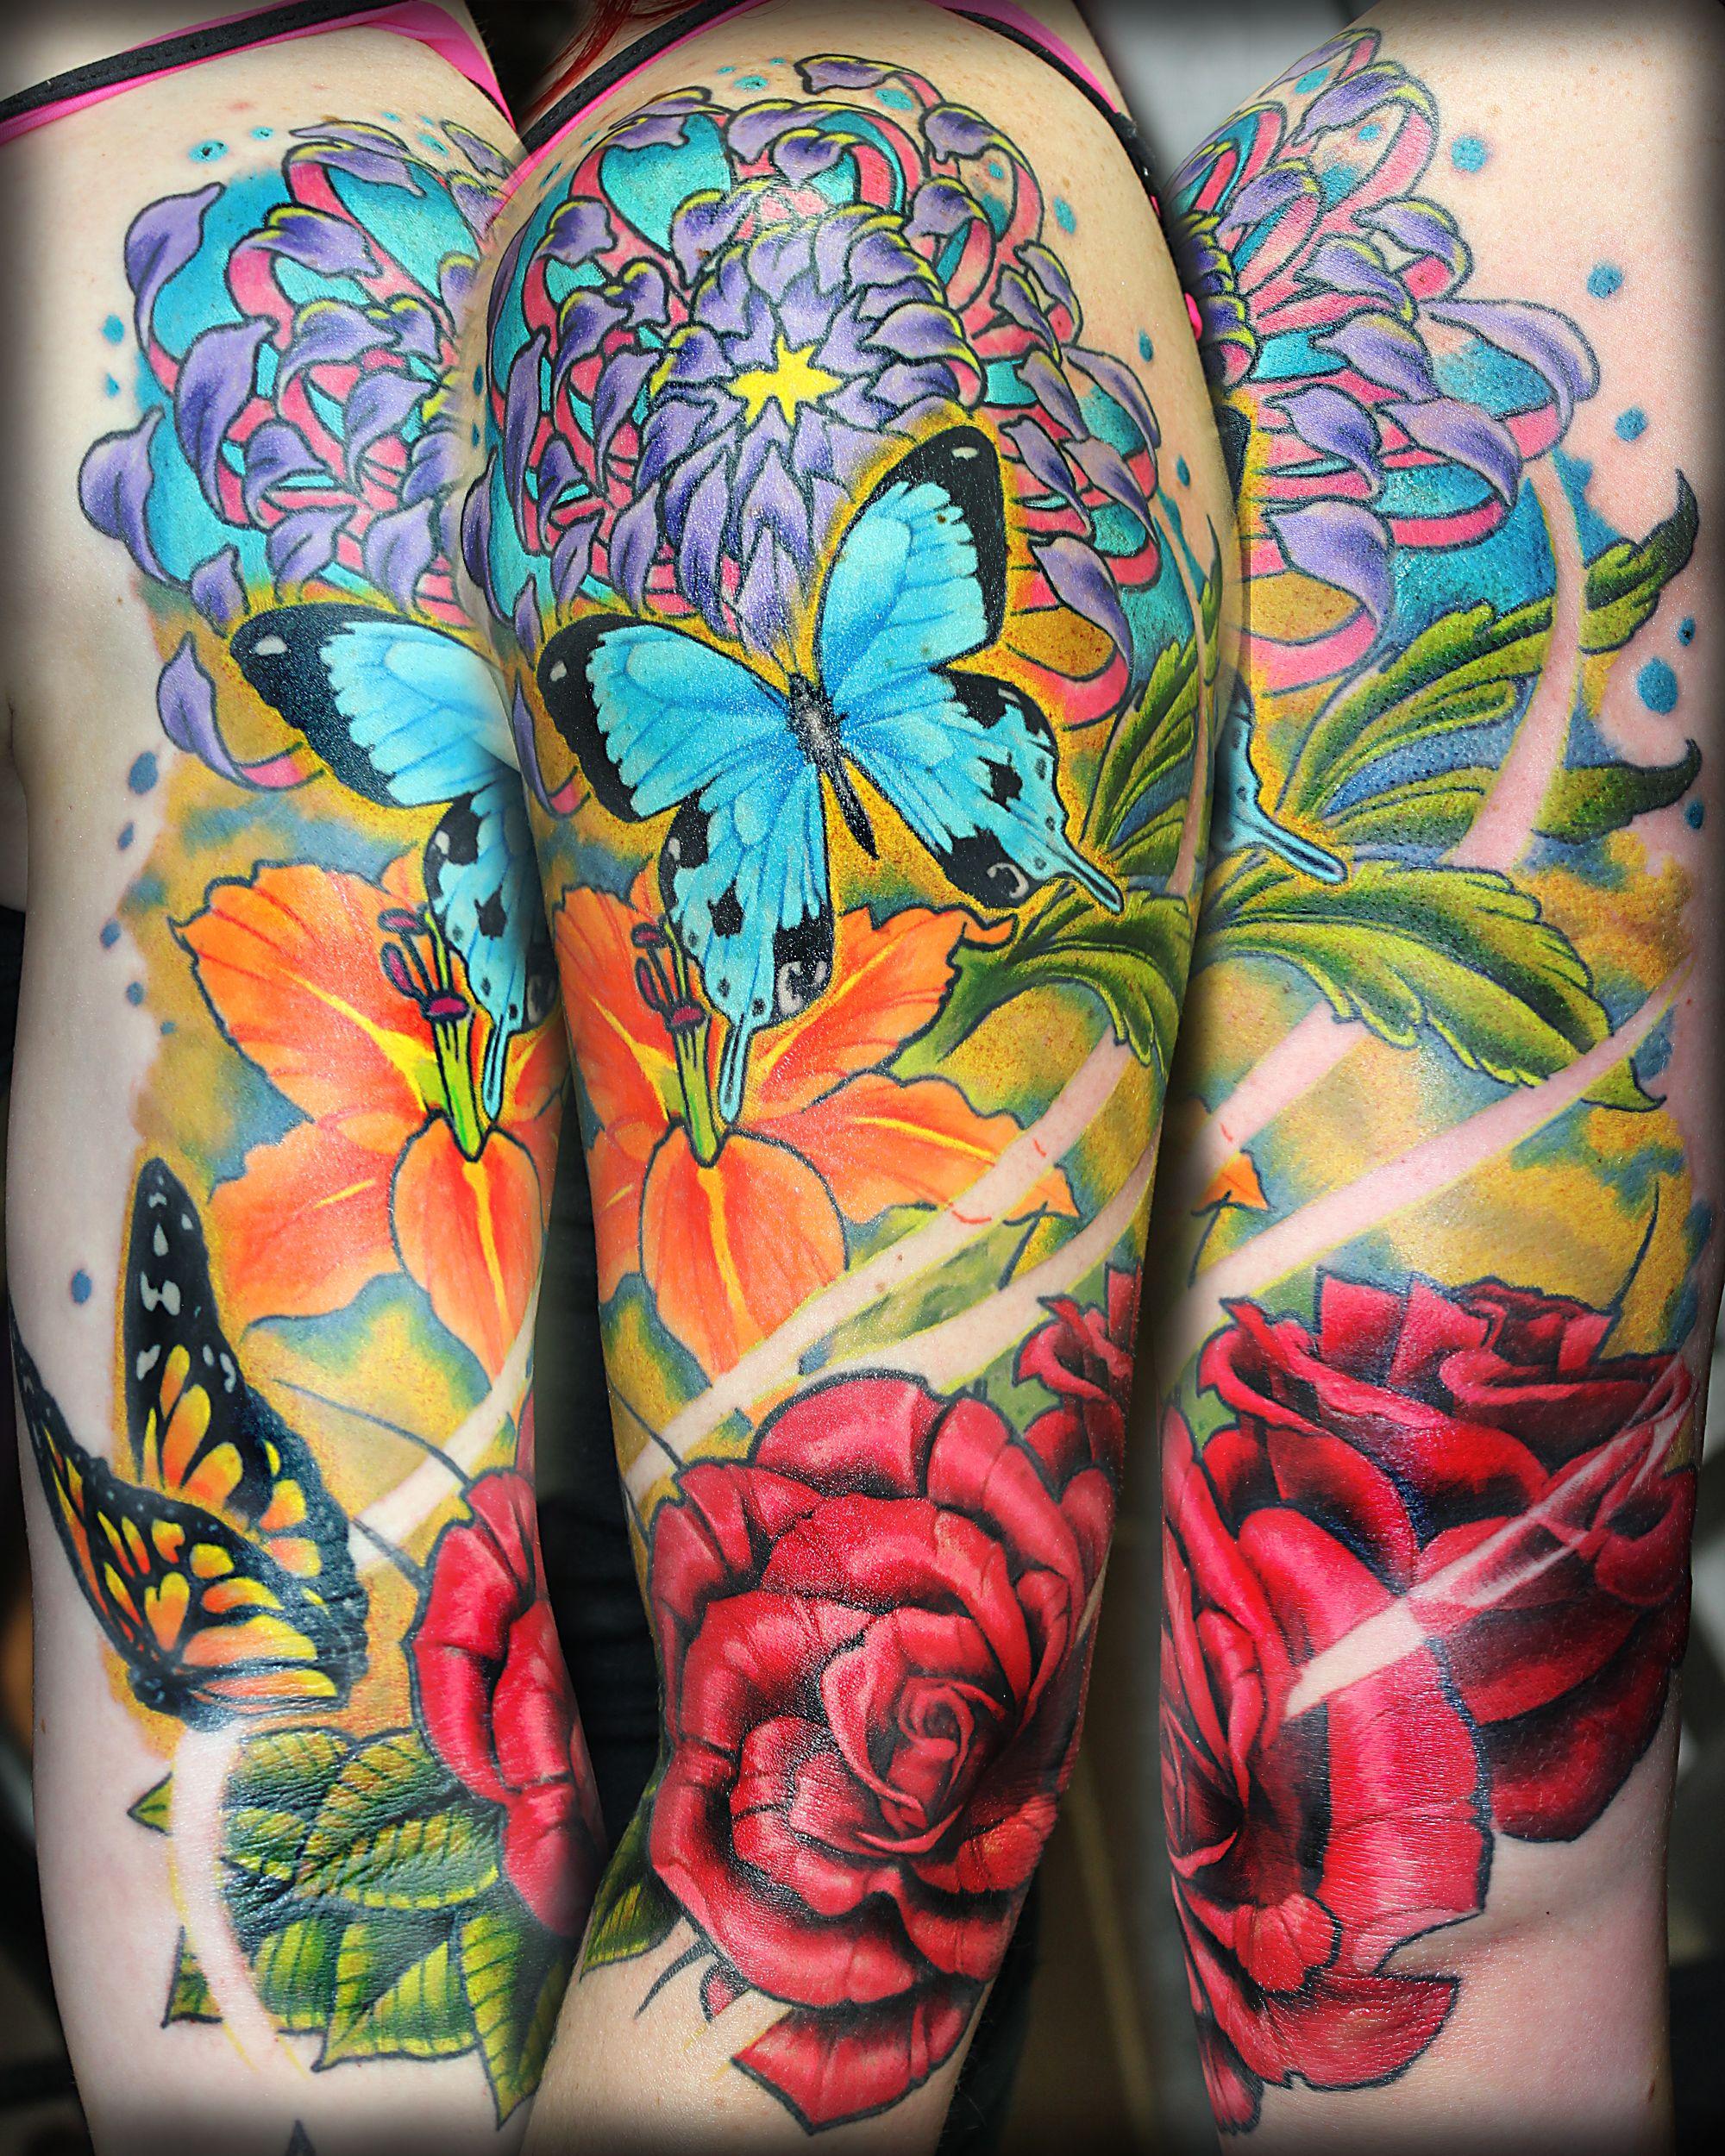 Japanese calf tattoos by durb - Japanese Flower Tattoo Japanese Wave Tattoos And Incredible Tattoos